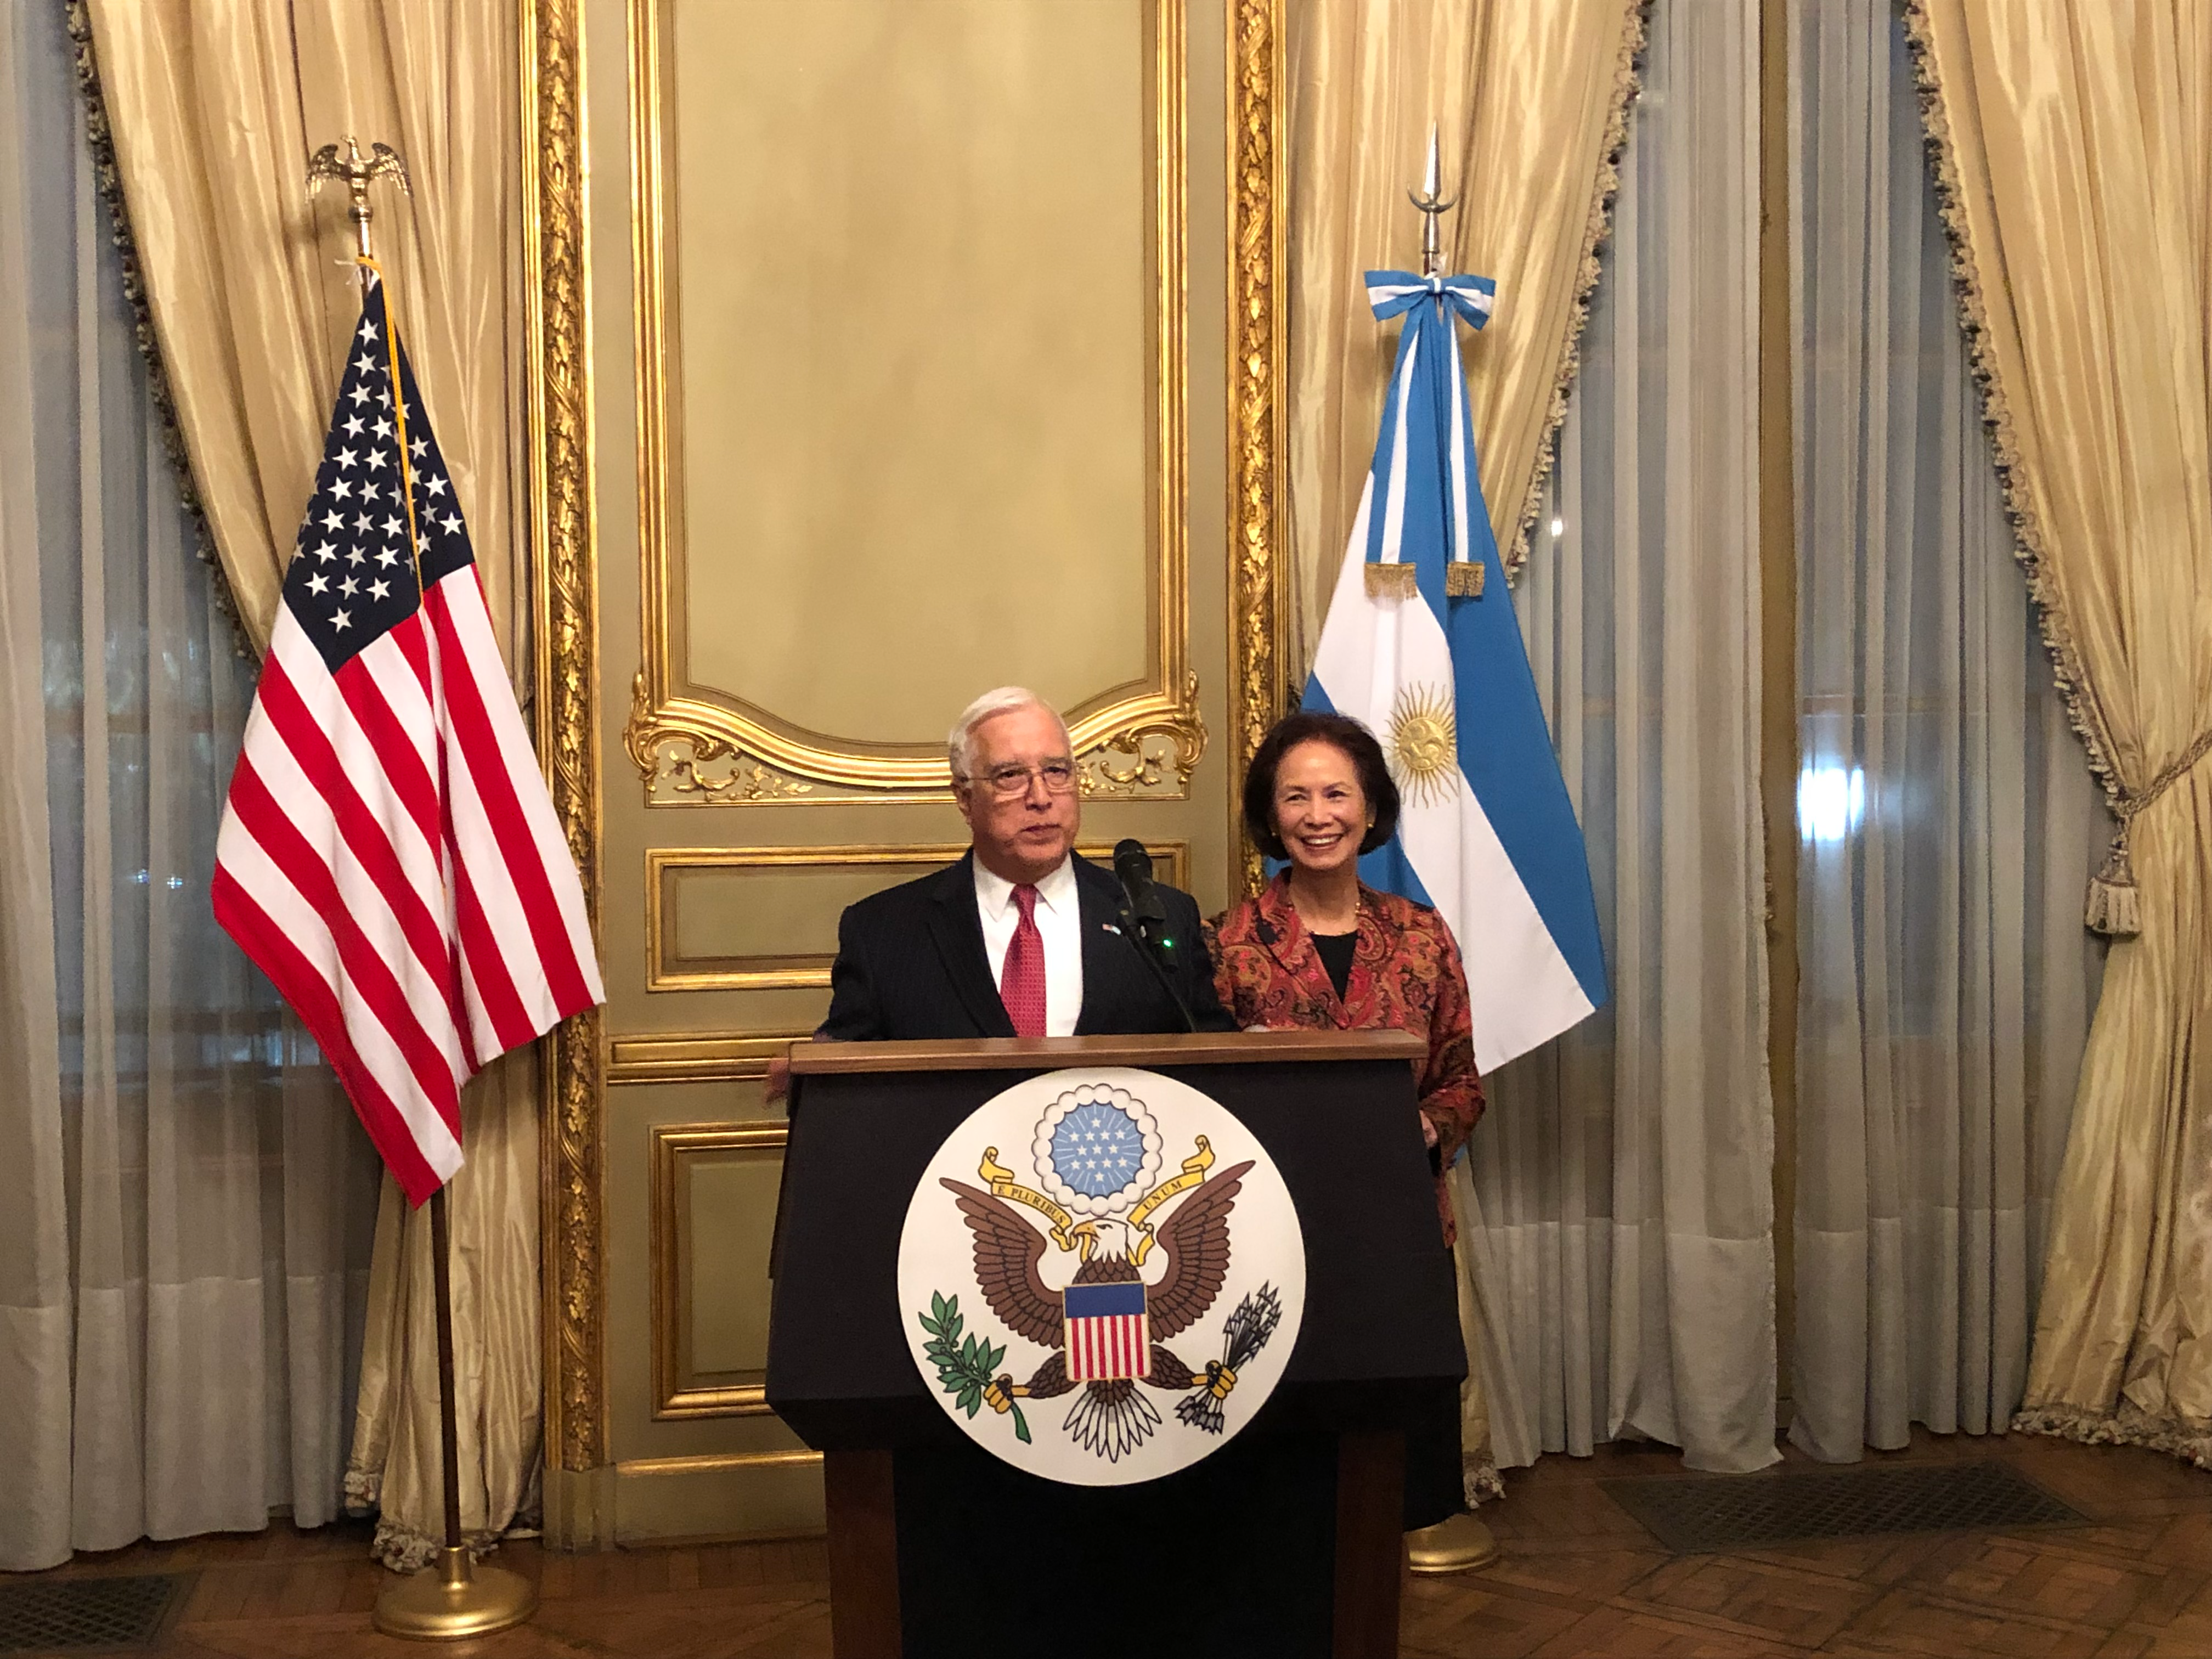 U.S. Ambassador Edward Prado & His Wife, Maria